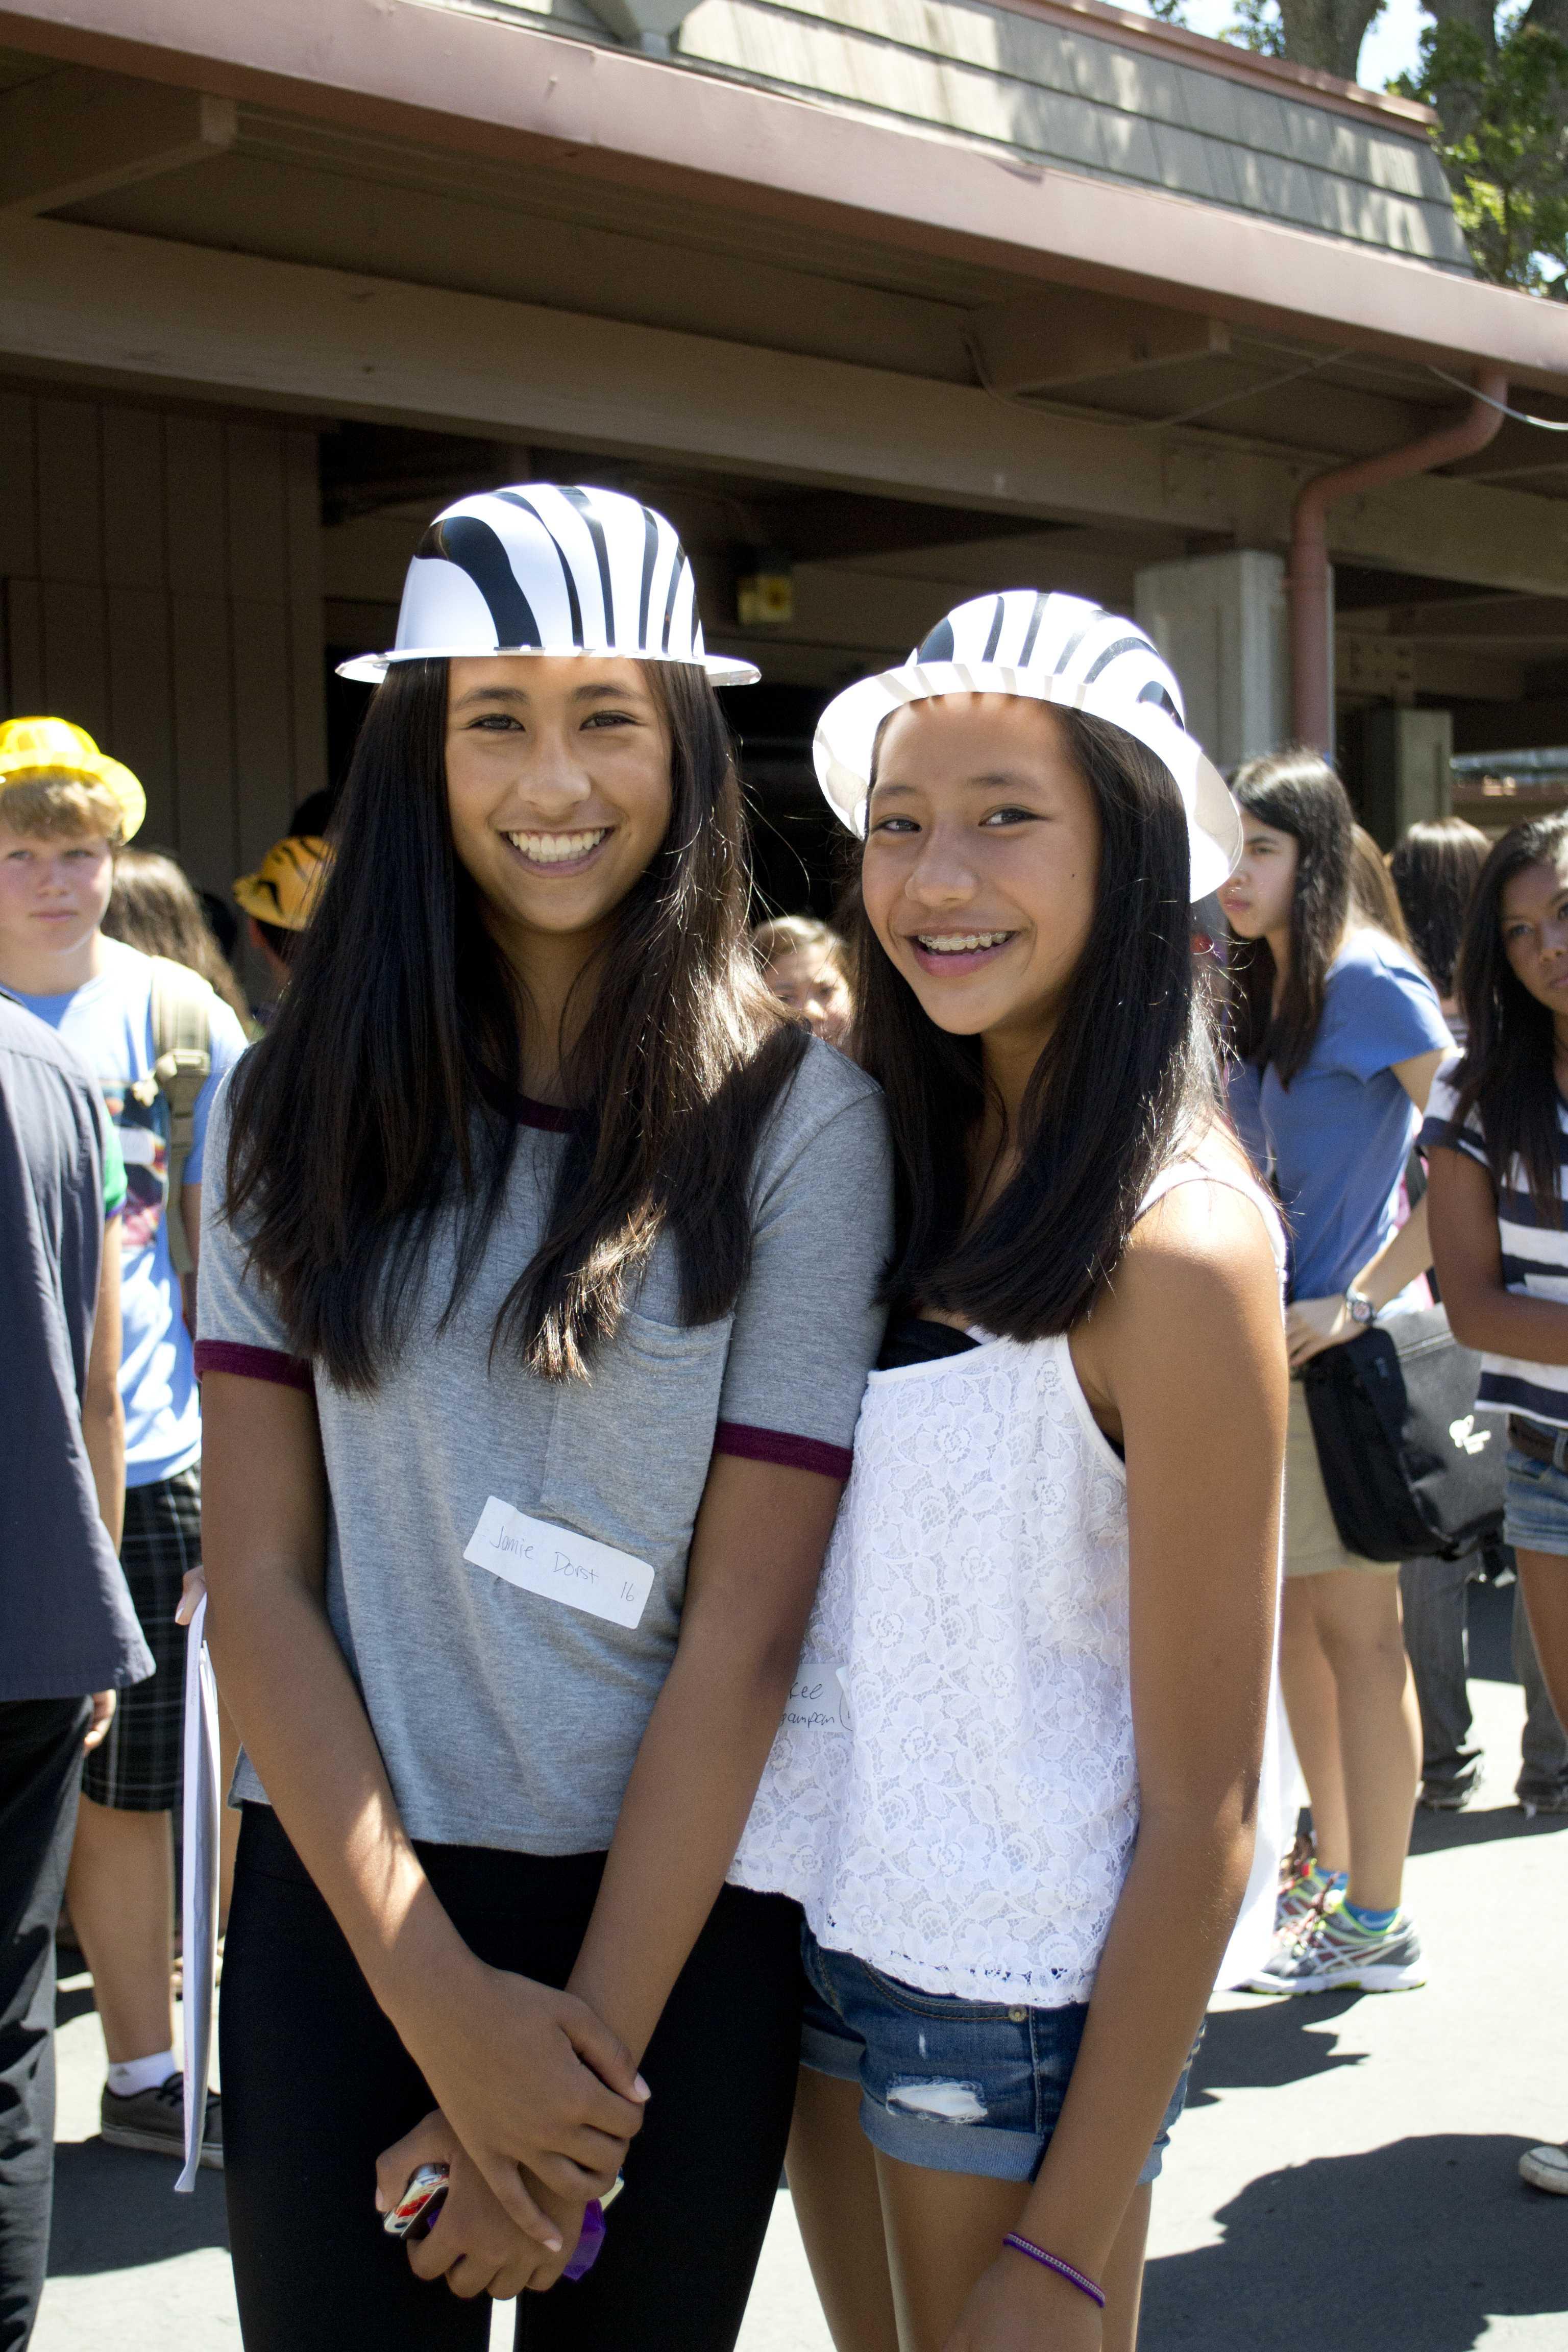 Freshmen Jamie Dorst and Mikaela Cagampan in hard hats.